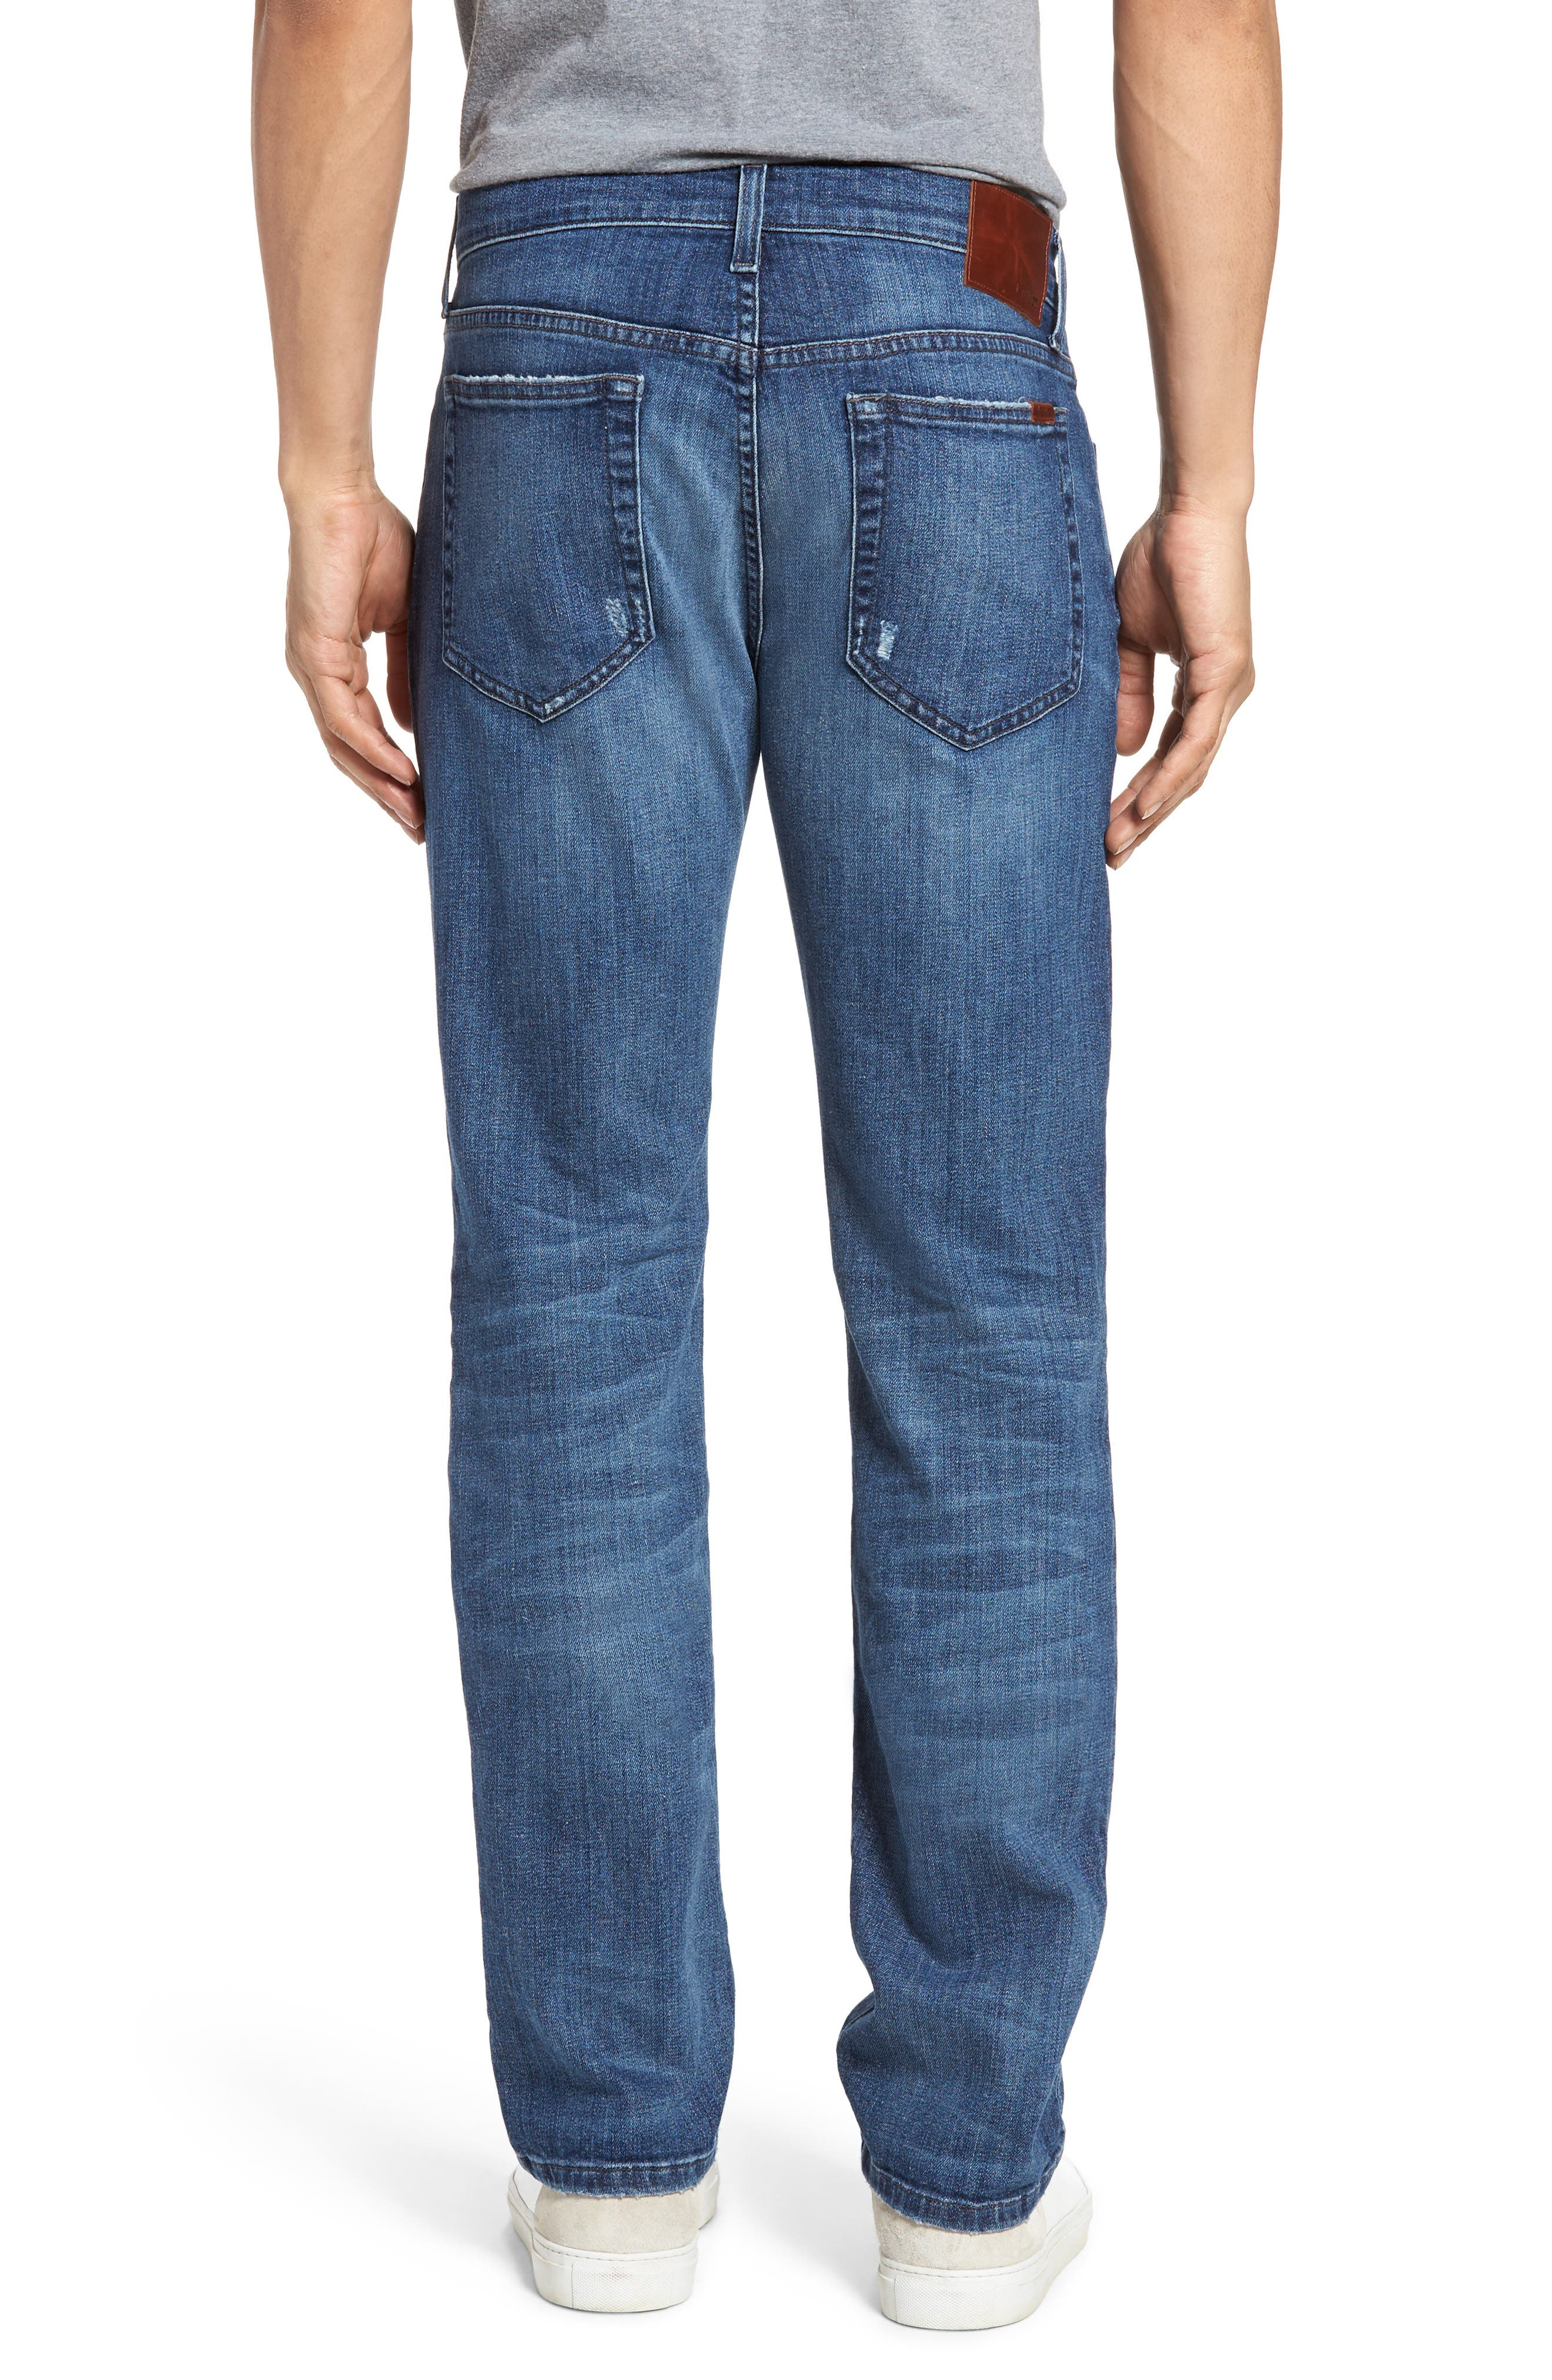 Brixton Slim Straight Leg Jeans,                             Alternate thumbnail 2, color,                             410